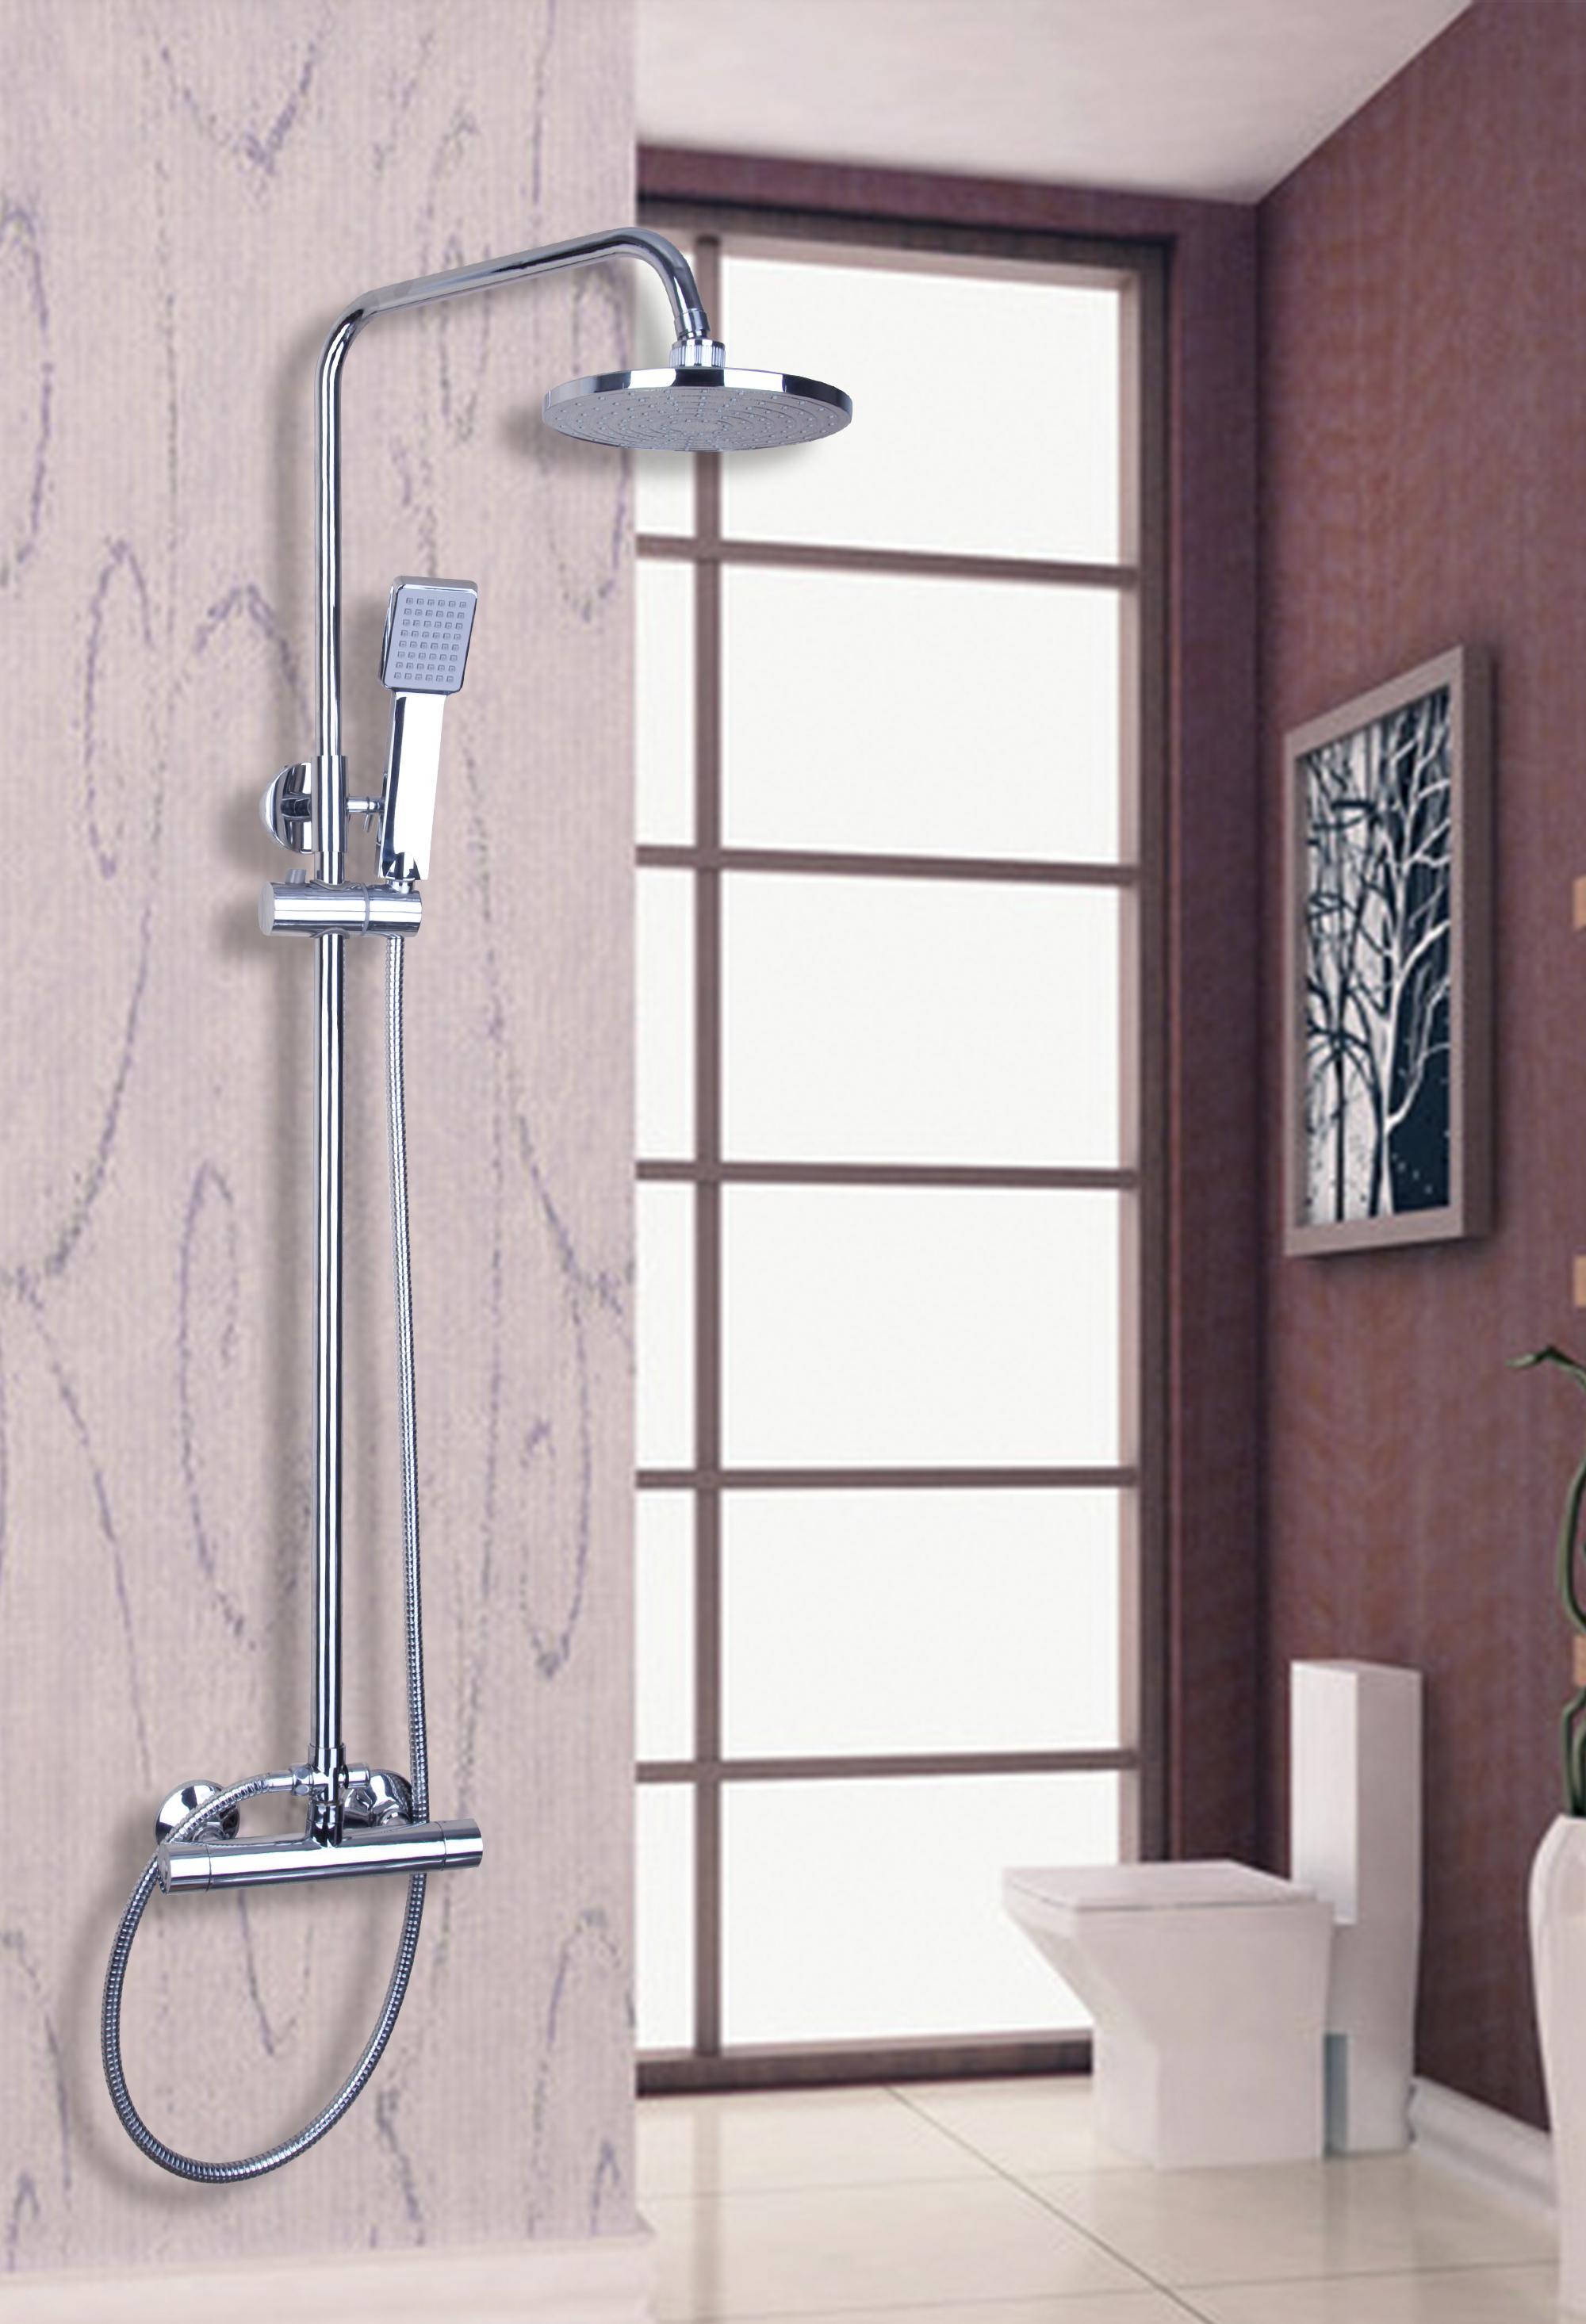 pit flush mount rain head luxurius mounted fire oksunglassesn table shower waterfall us ceiling propane rainfall home top